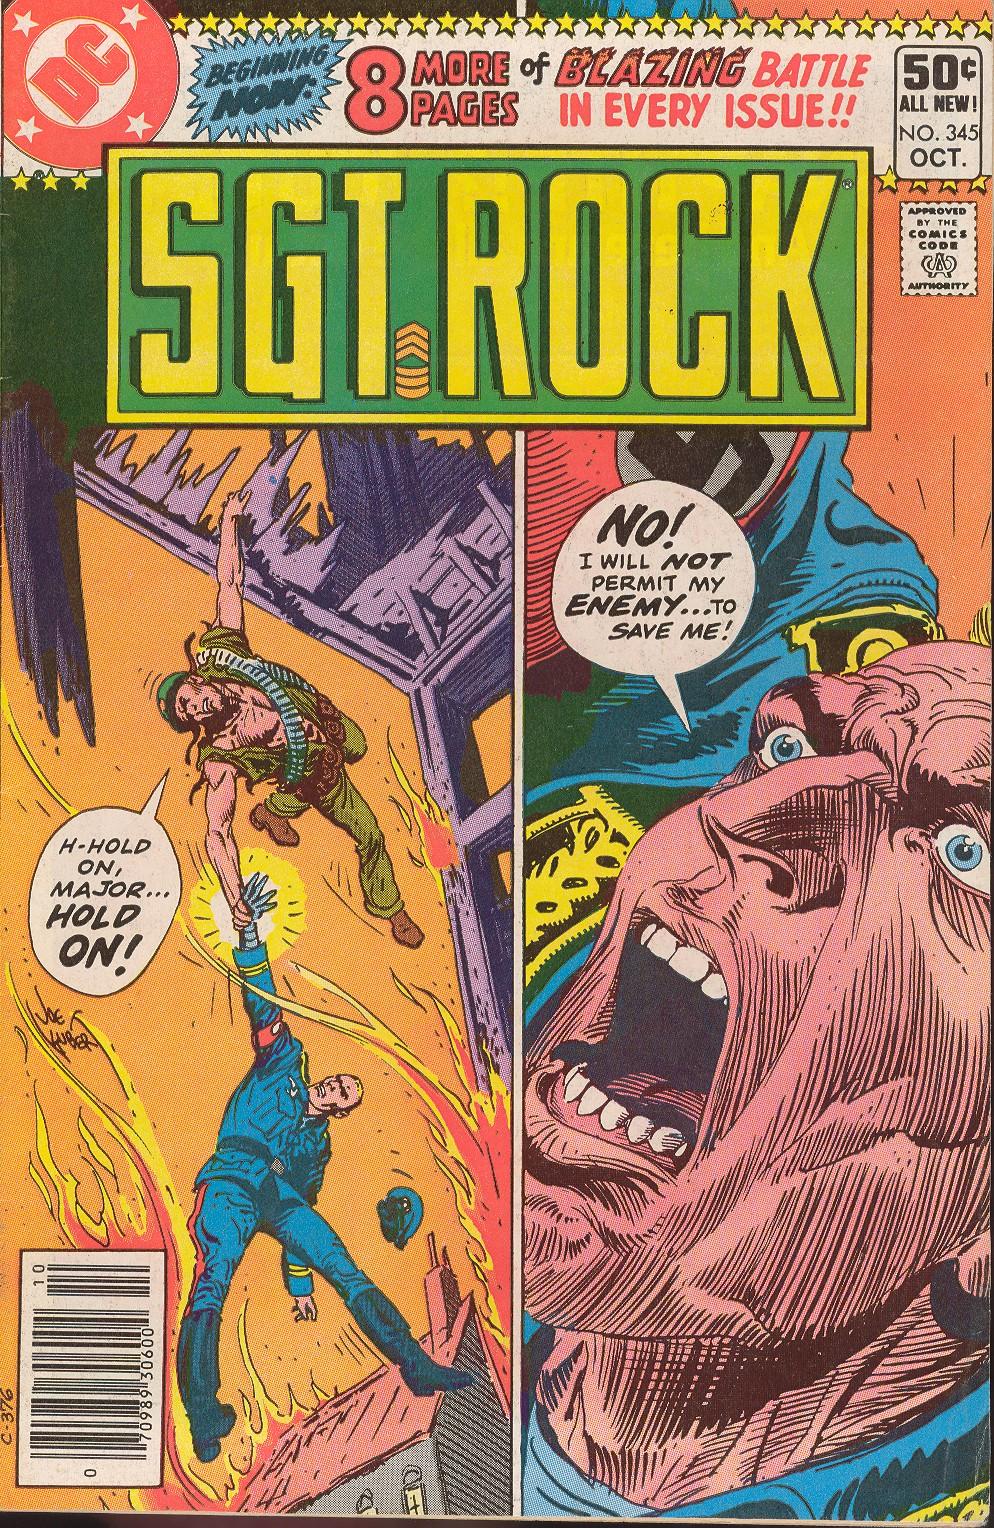 Read online Sgt. Rock comic -  Issue #345 - 1